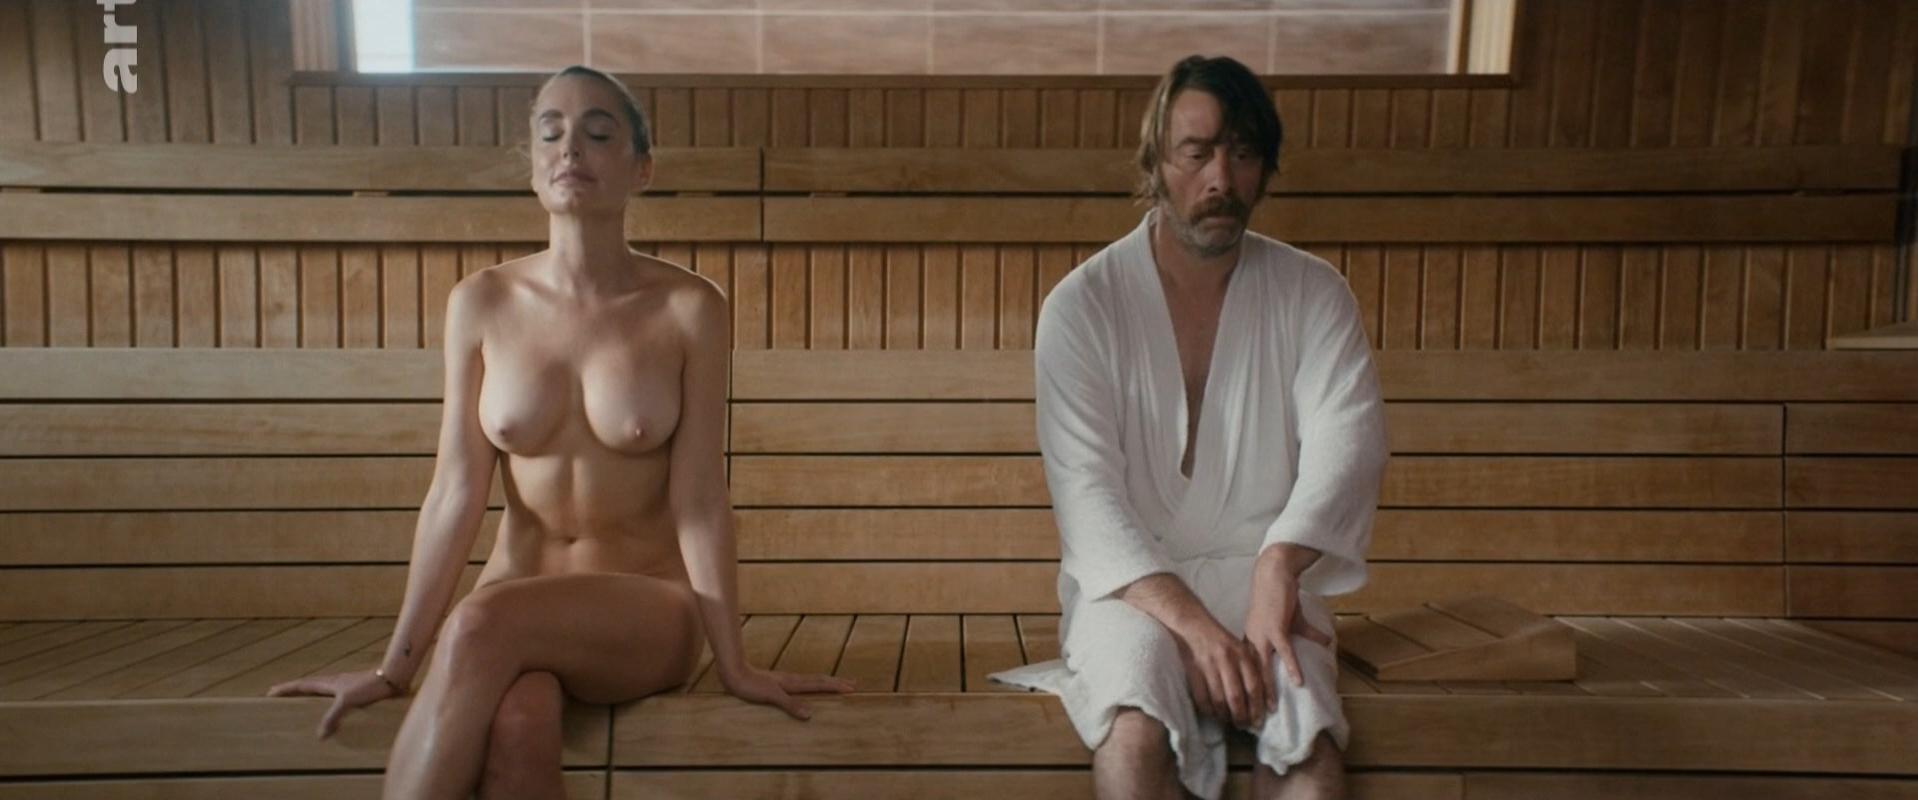 Sylvia Dierckx nude, Sofia Leboutte nude - Vihta (2018)